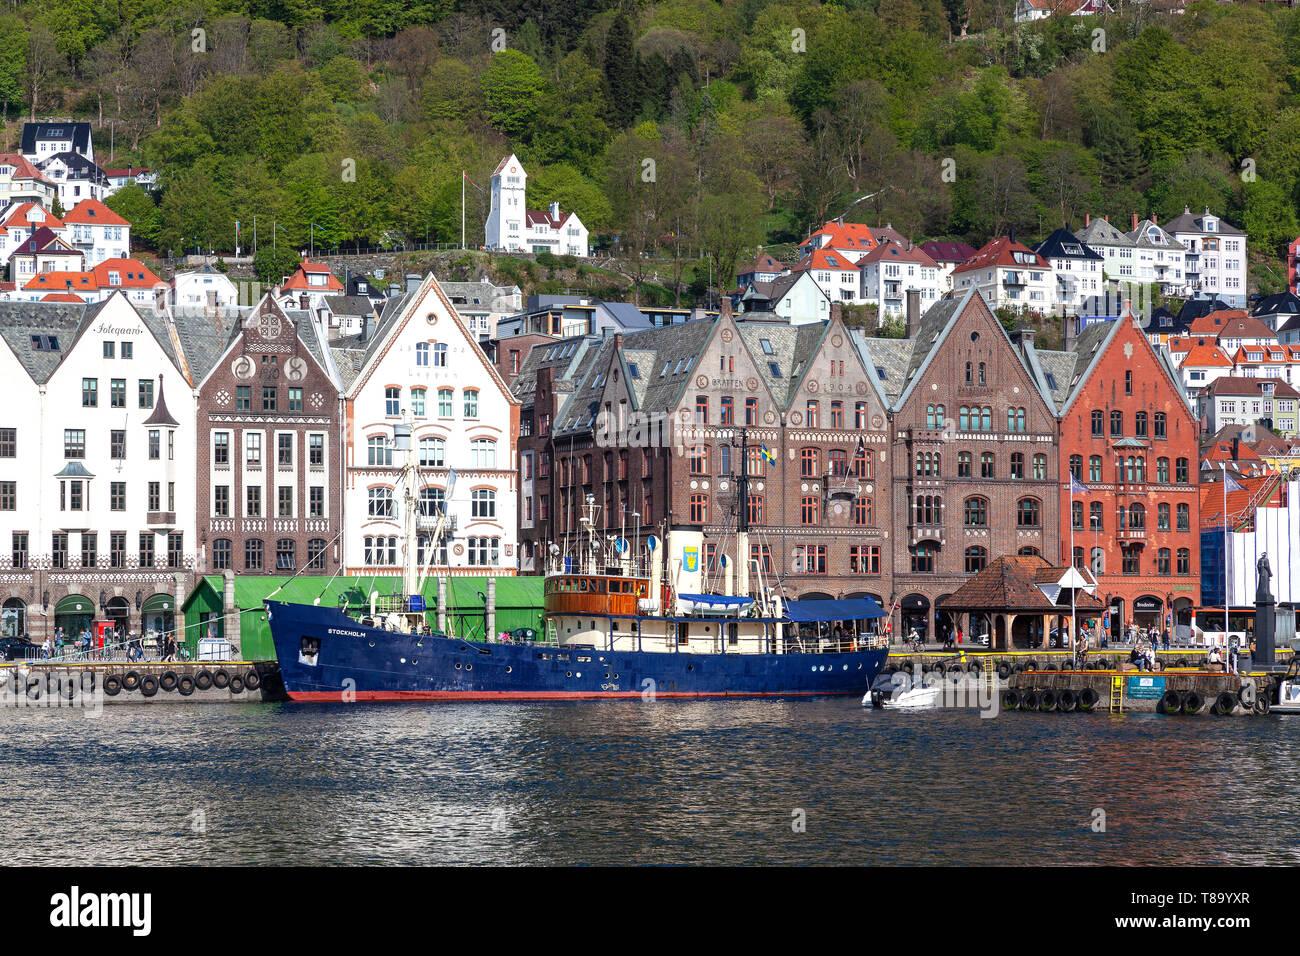 Swedish veteran passenger vessel Stockholm moored at the Hanseatic Bryggen in the port of Bergen, Norway - Stock Image